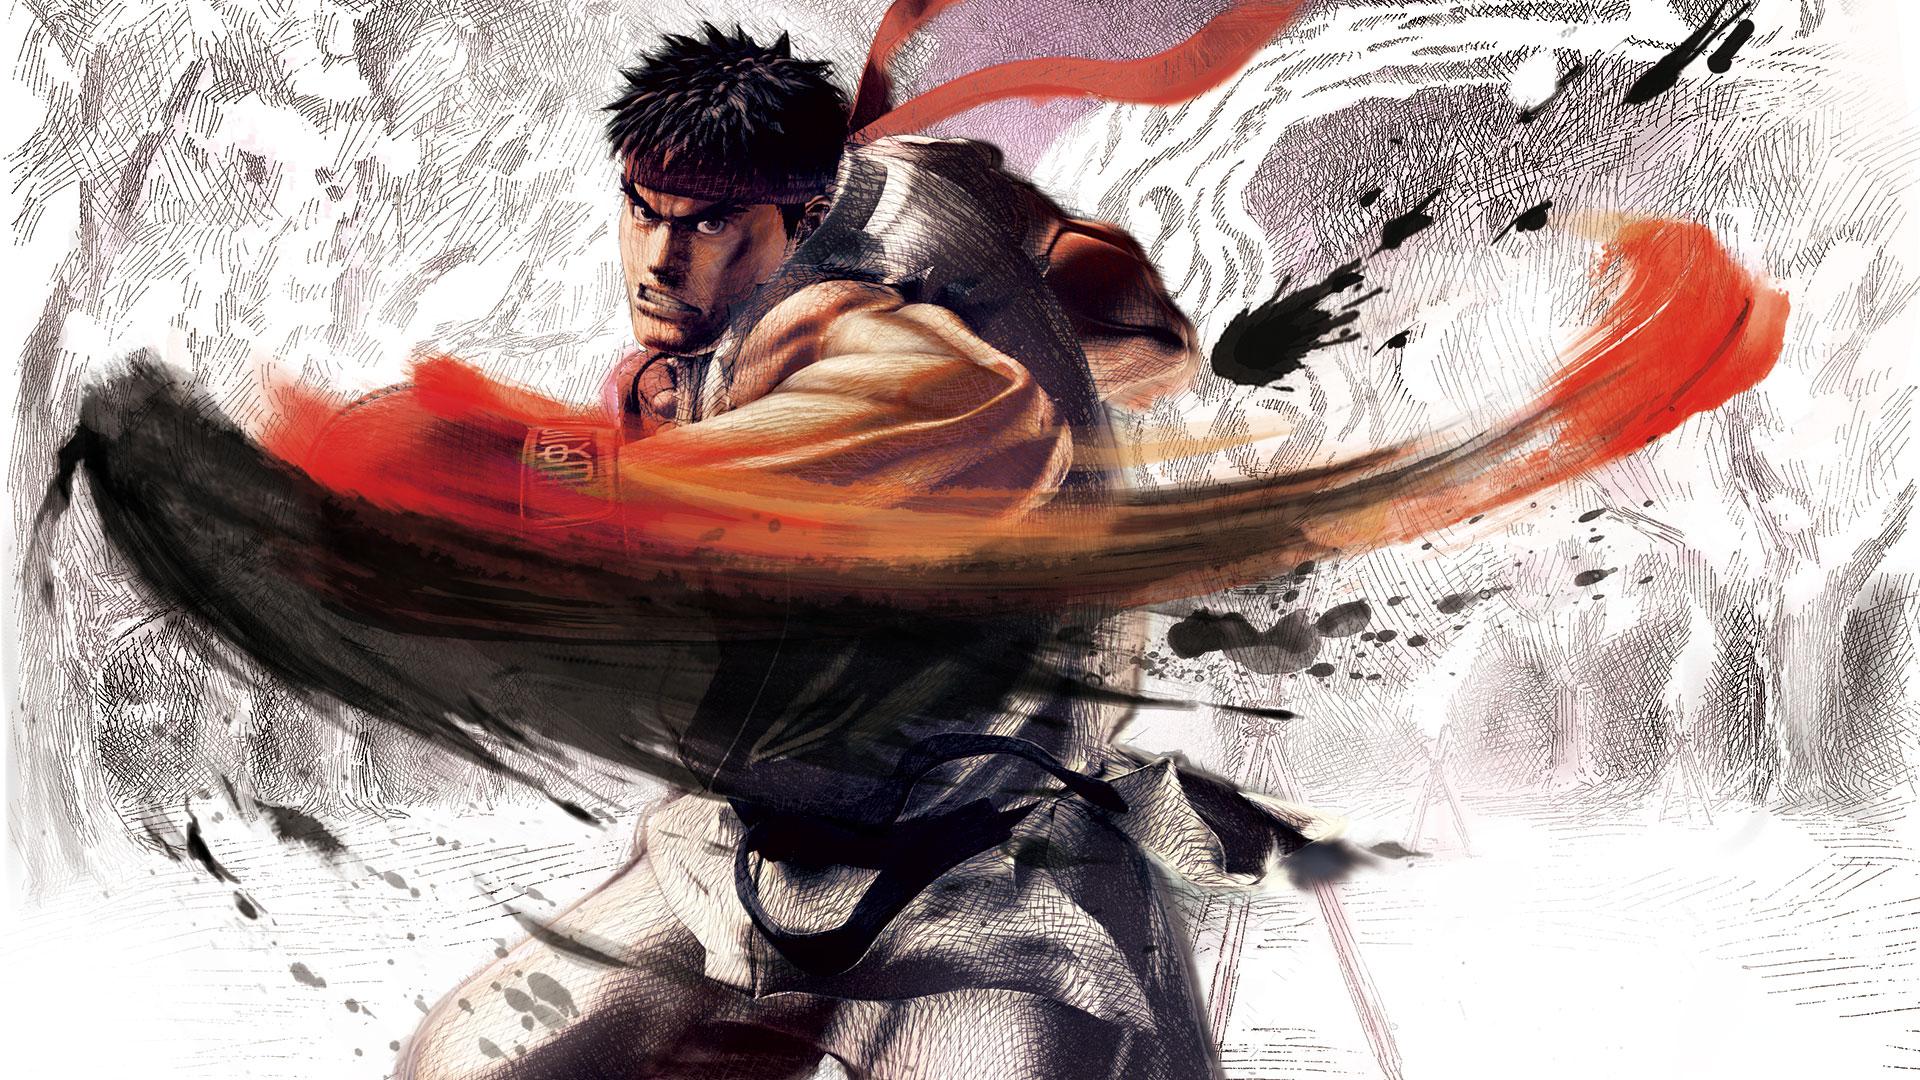 Street Fighter 5 Wallpaper: Wallpaper #9 Wallpaper From Ultra Street Fighter IV